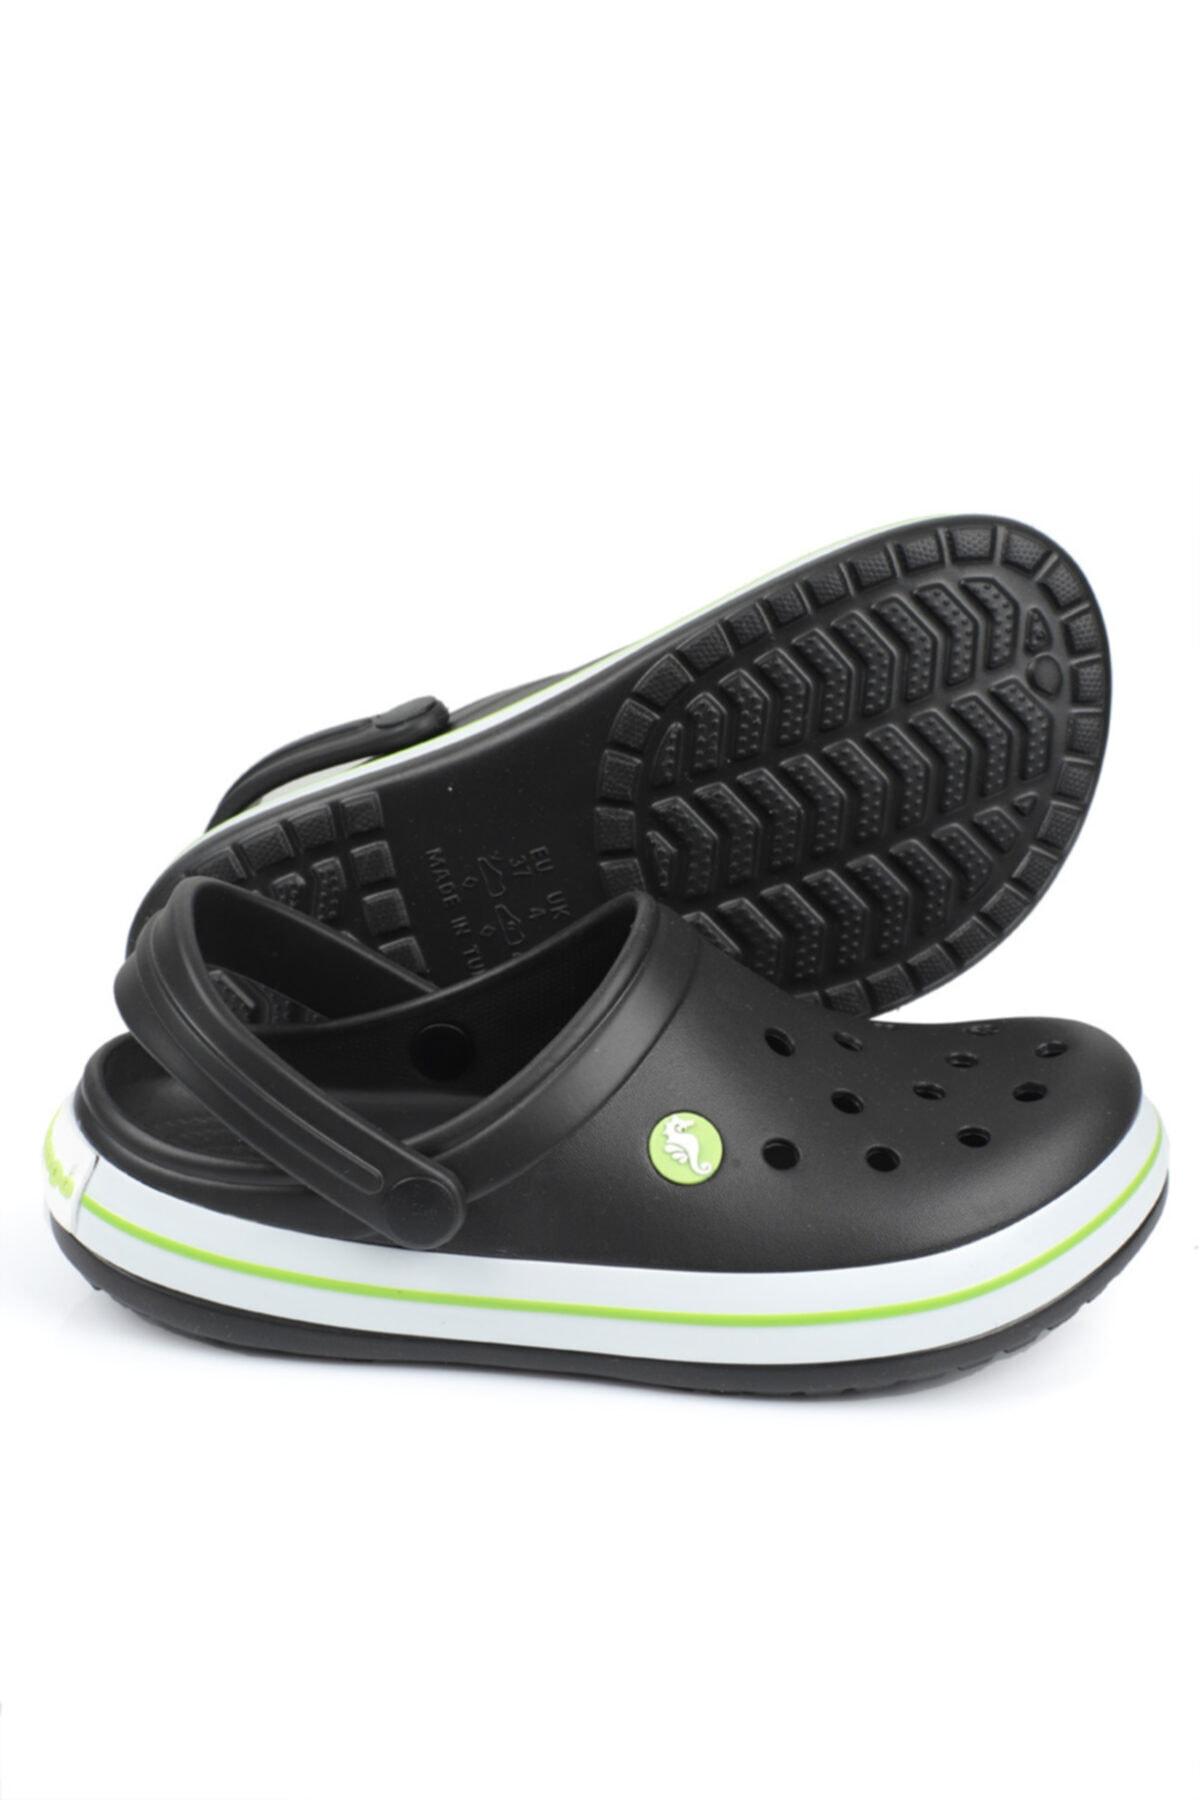 Unisex Sabo Sandalet Terlik